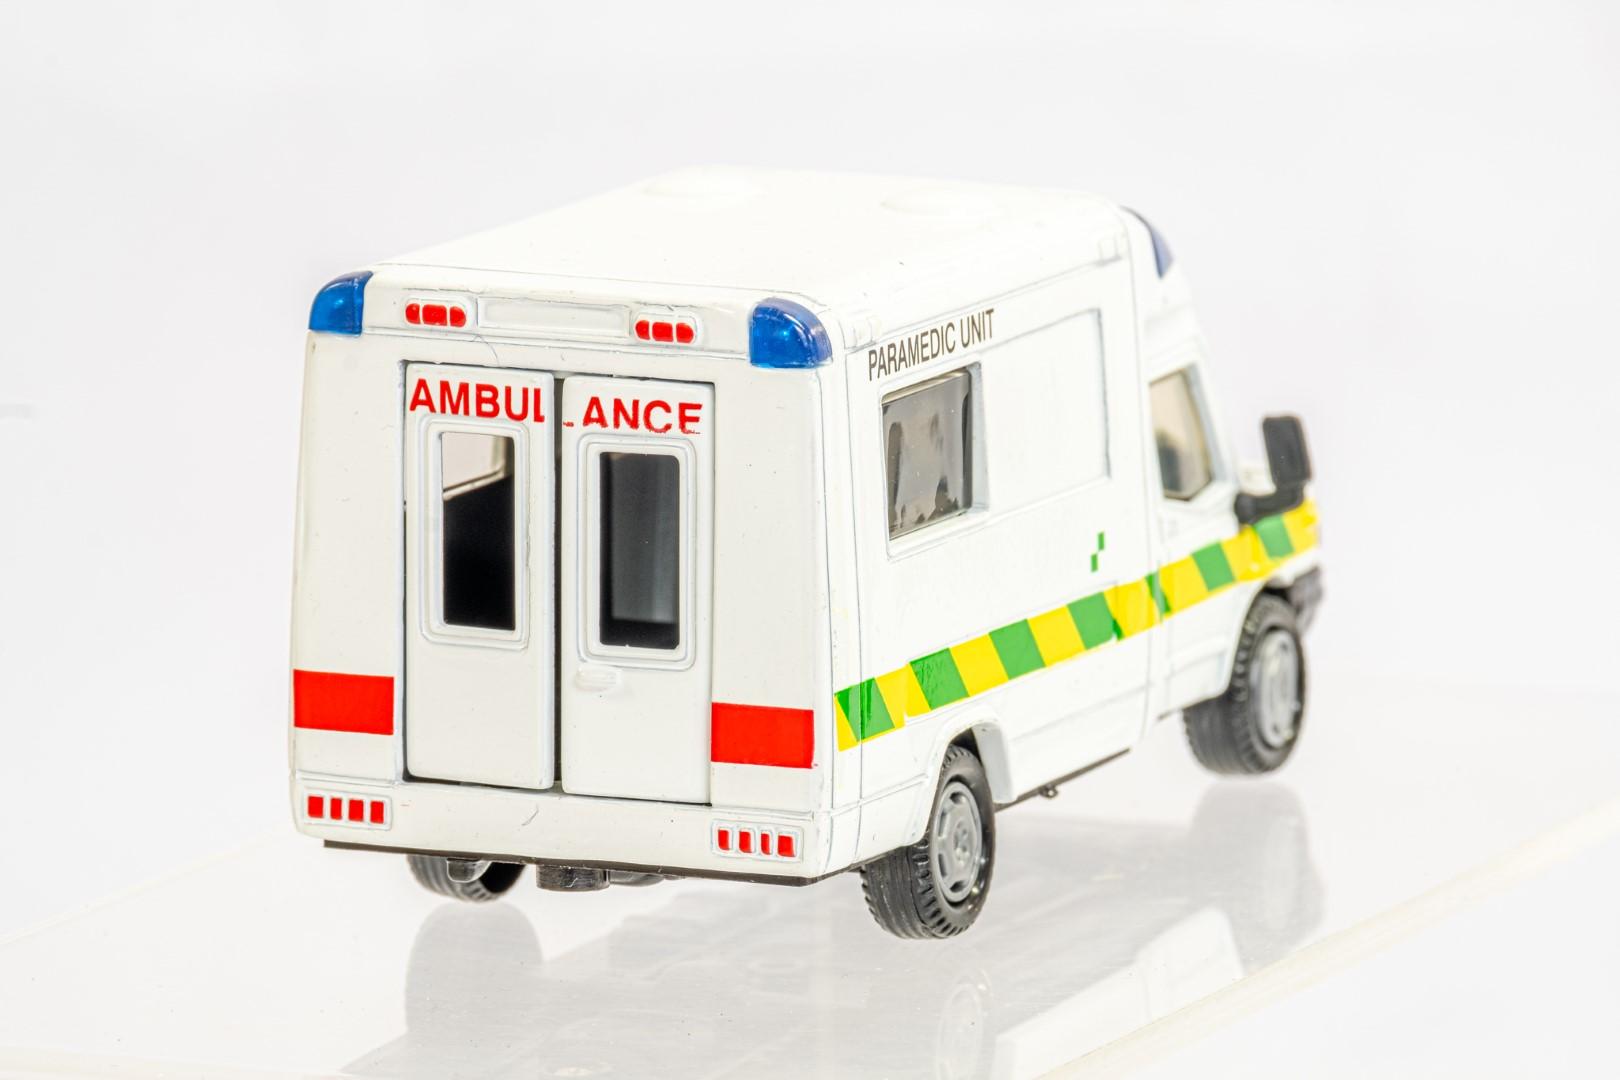 4 x Assorted Ambulance - Image 9 of 9